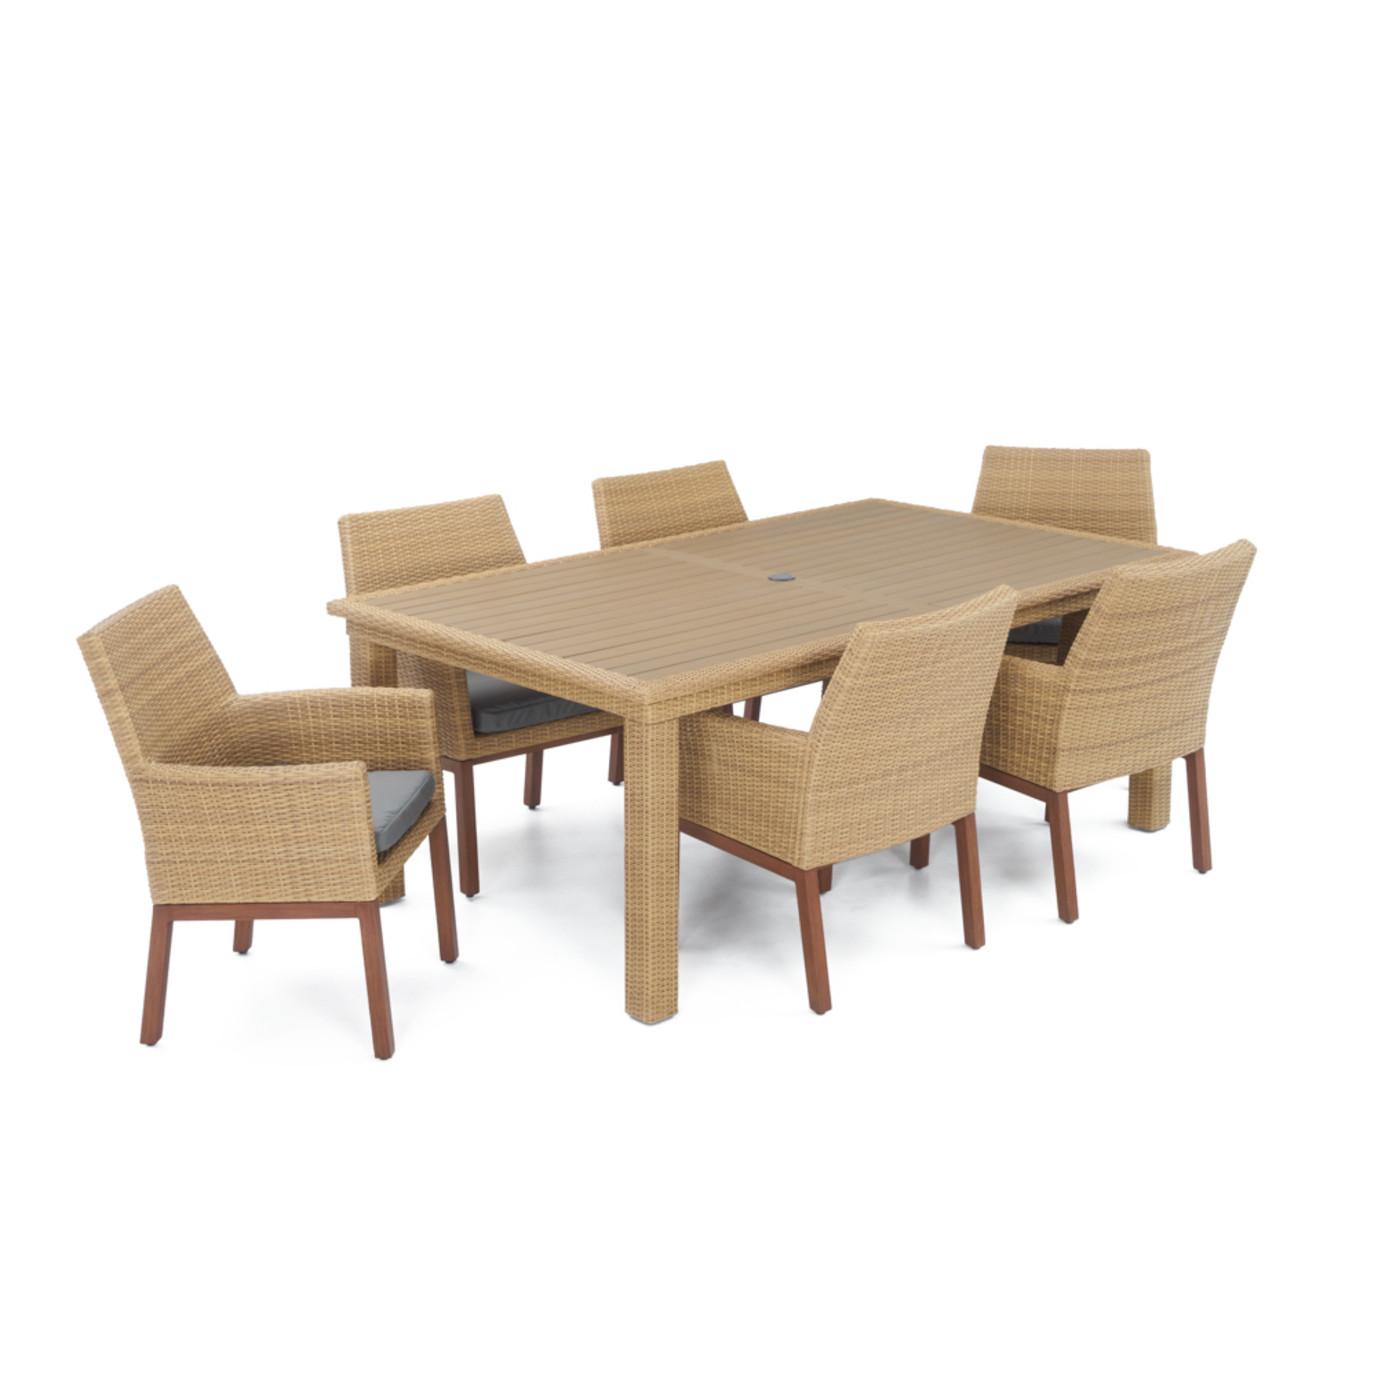 Mili™ 7 Piece Dining Set - Charcoal Gray